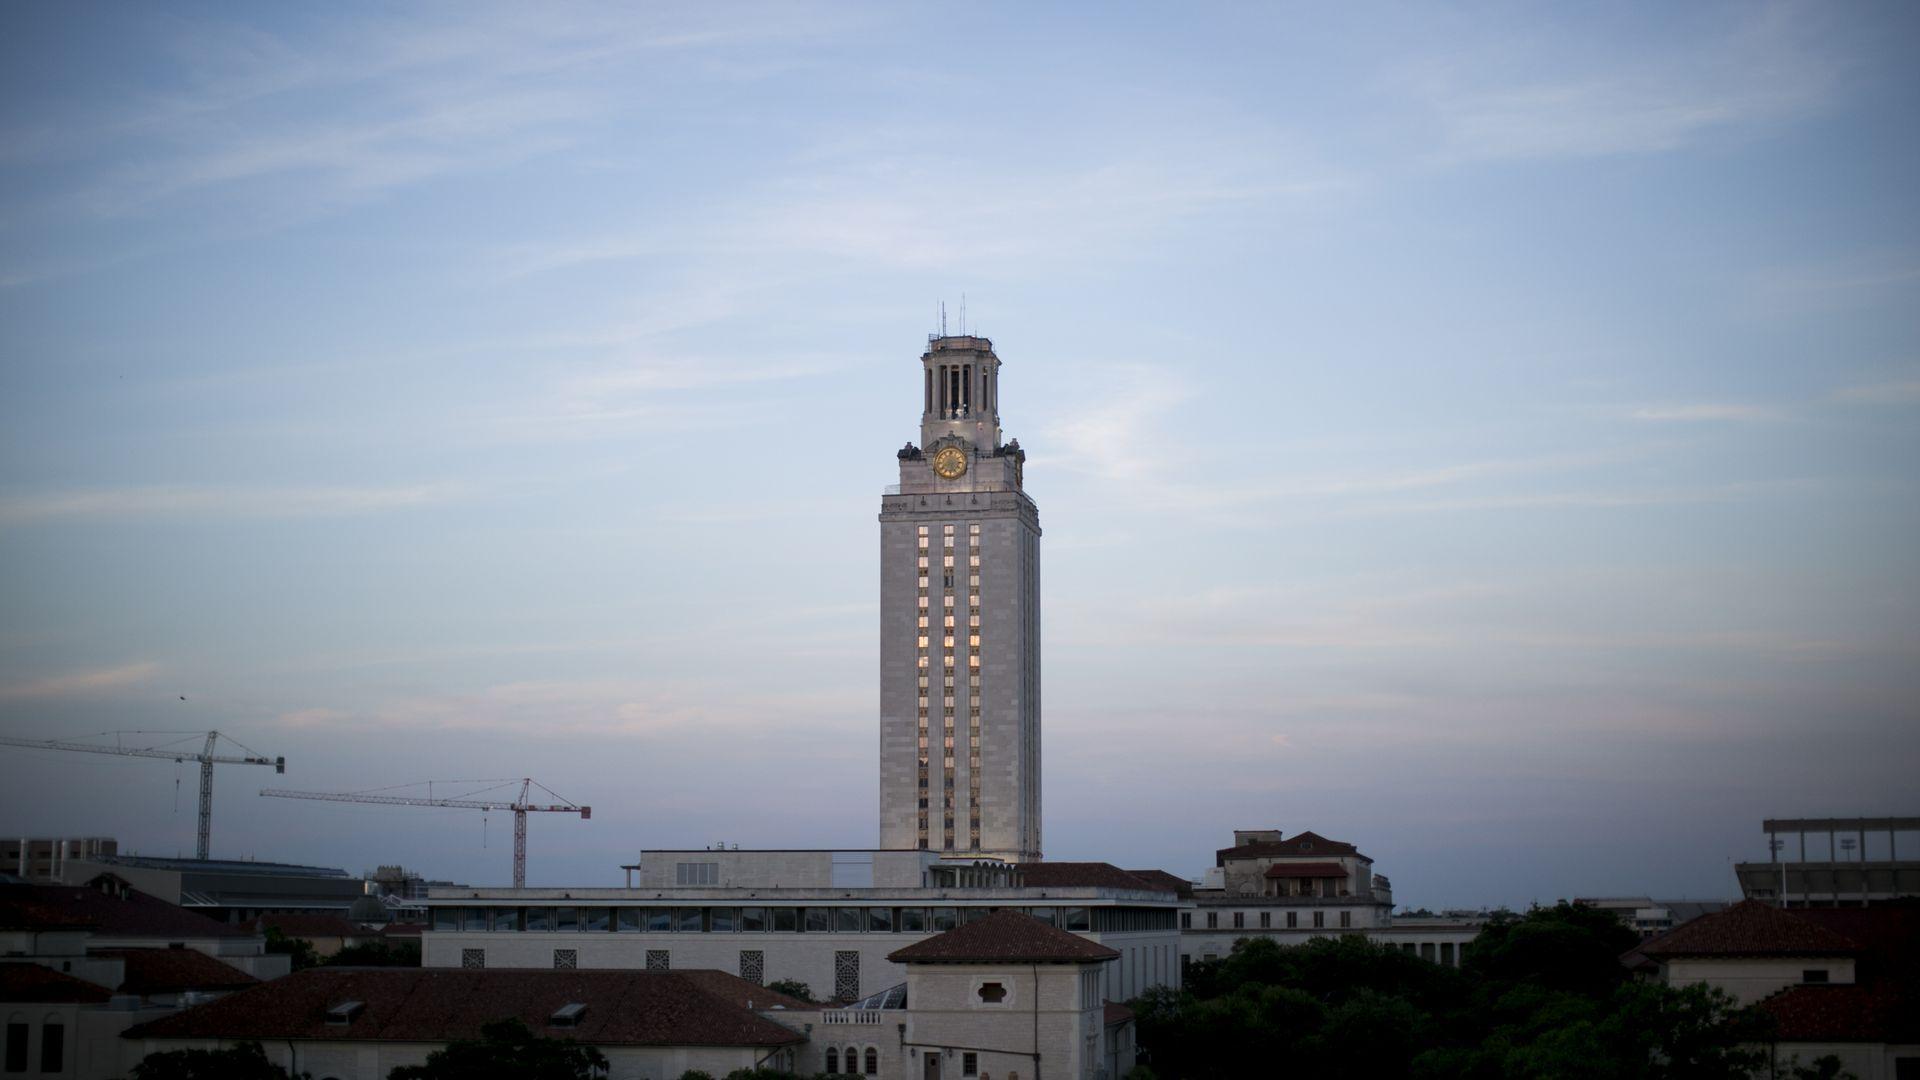 The University of Texas at Austin clocktower.